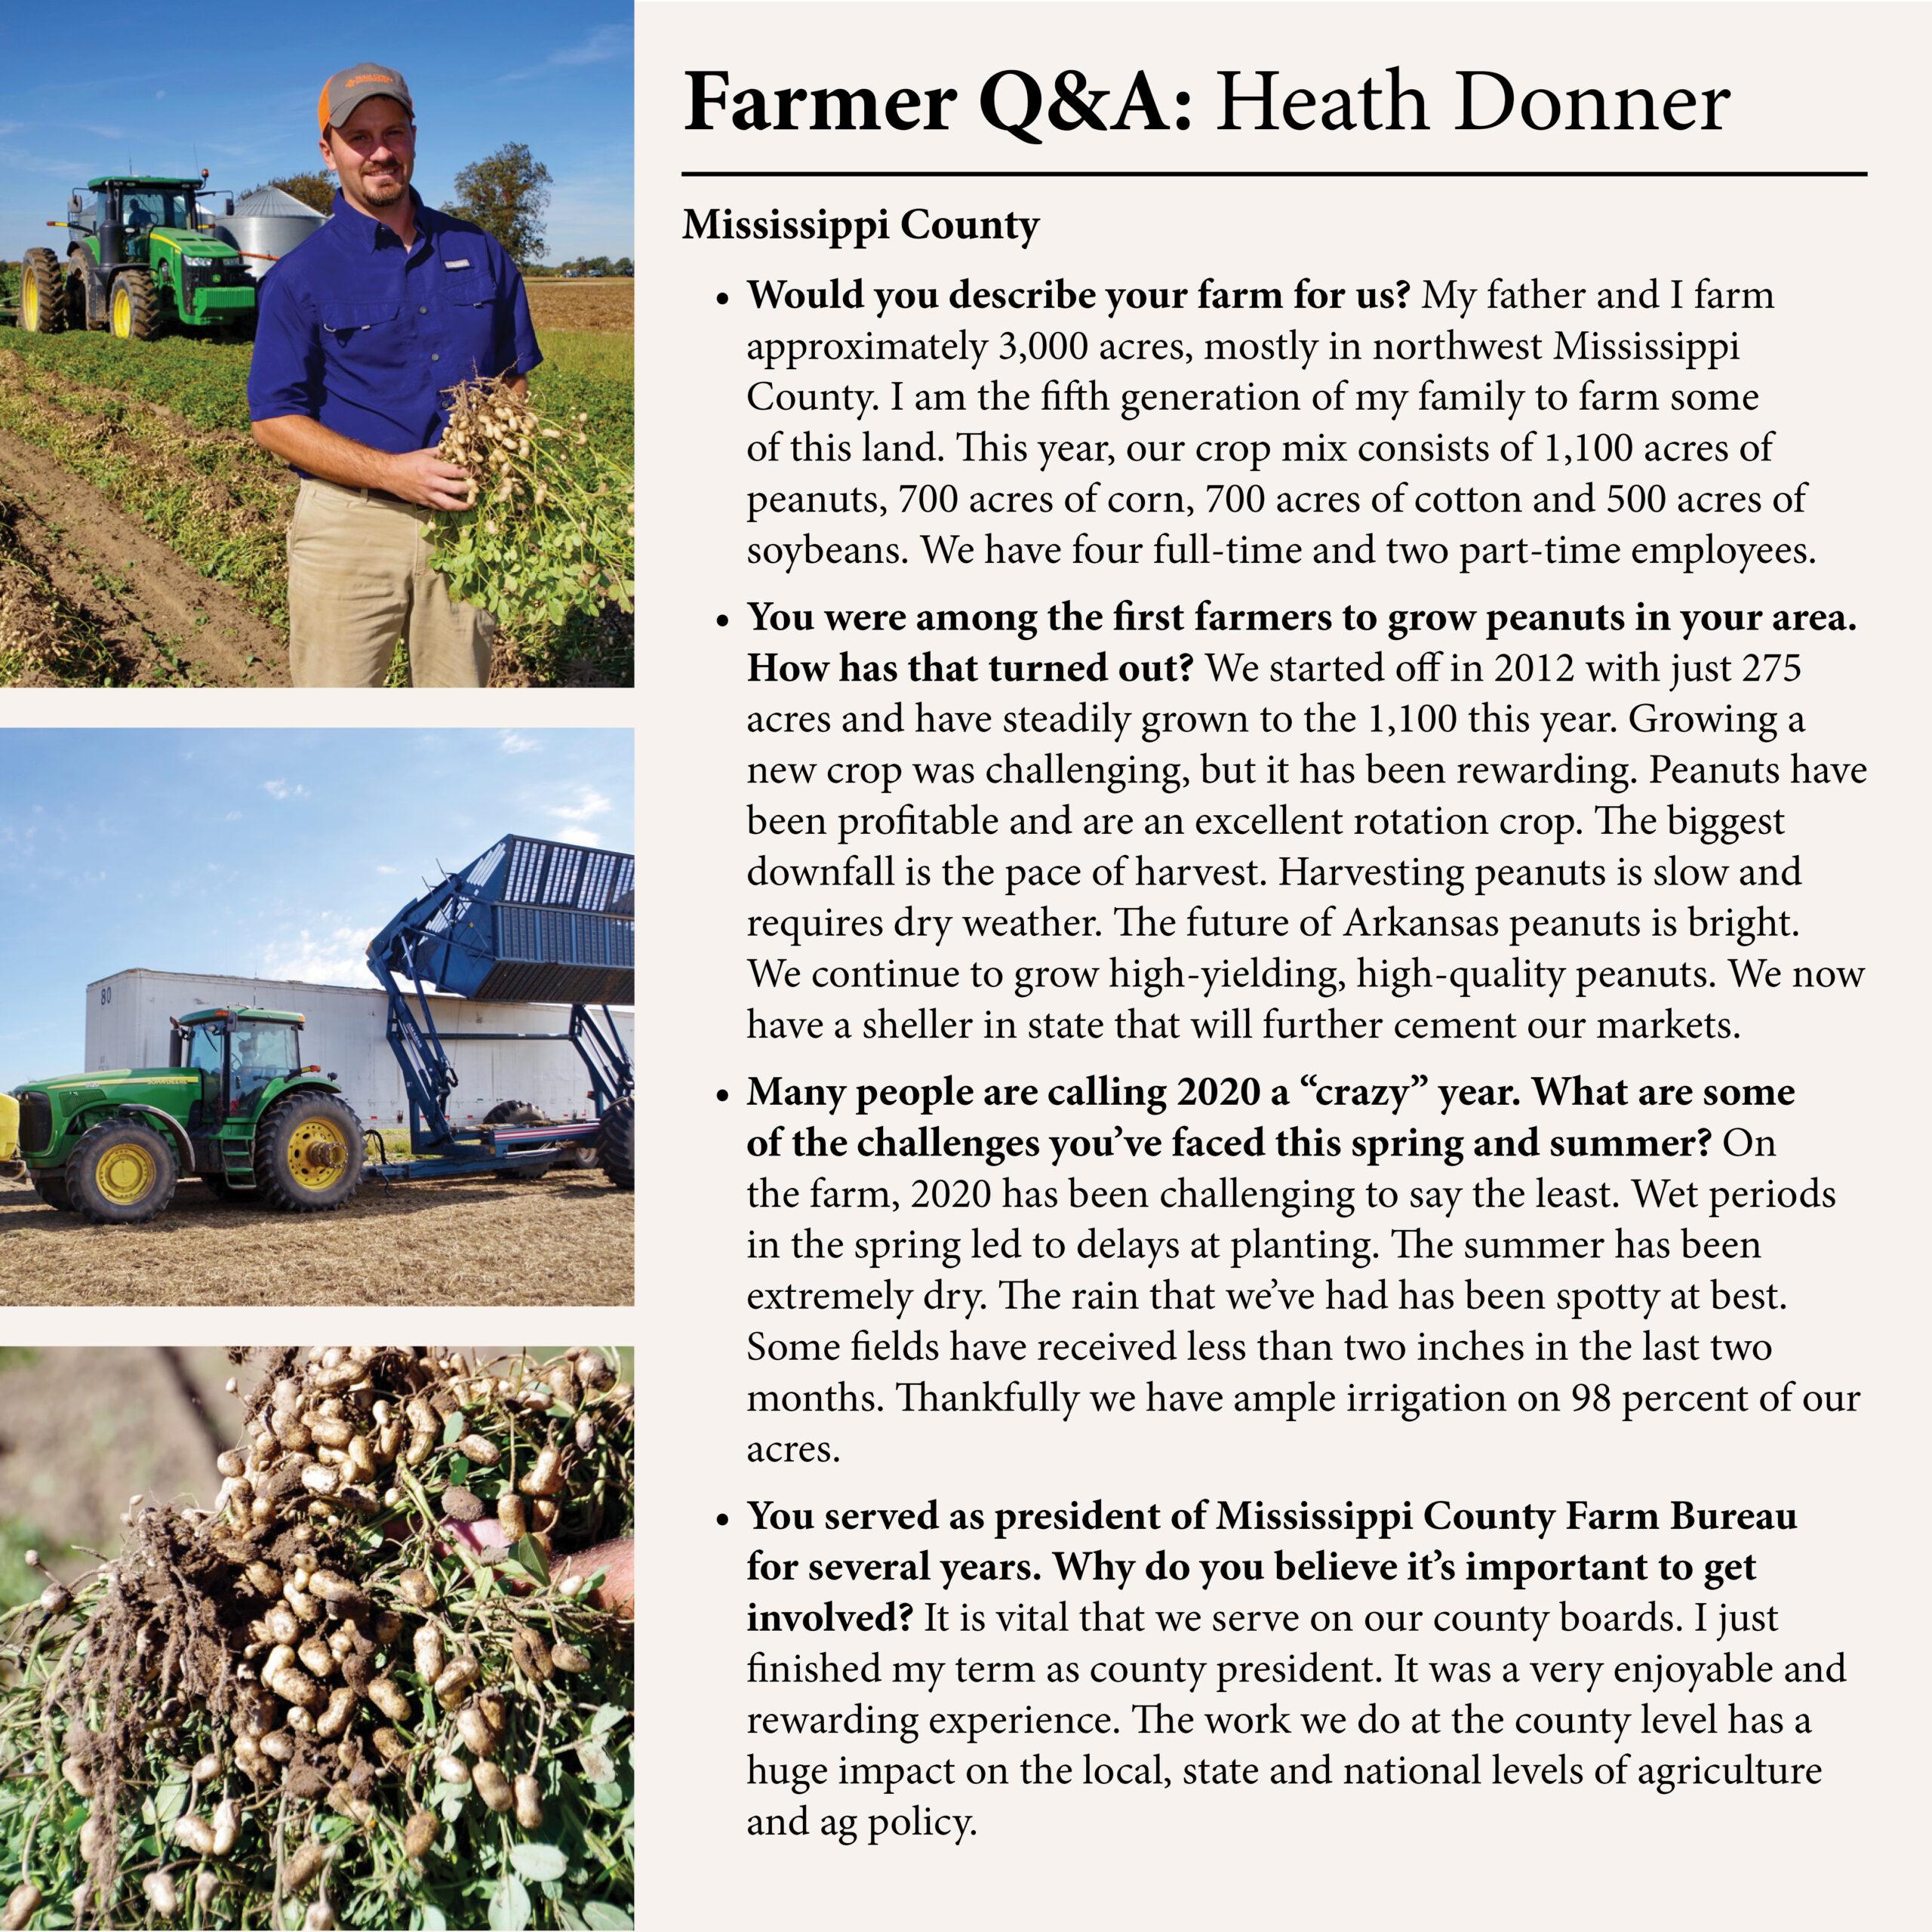 Farmer Q&A with Heath Donner